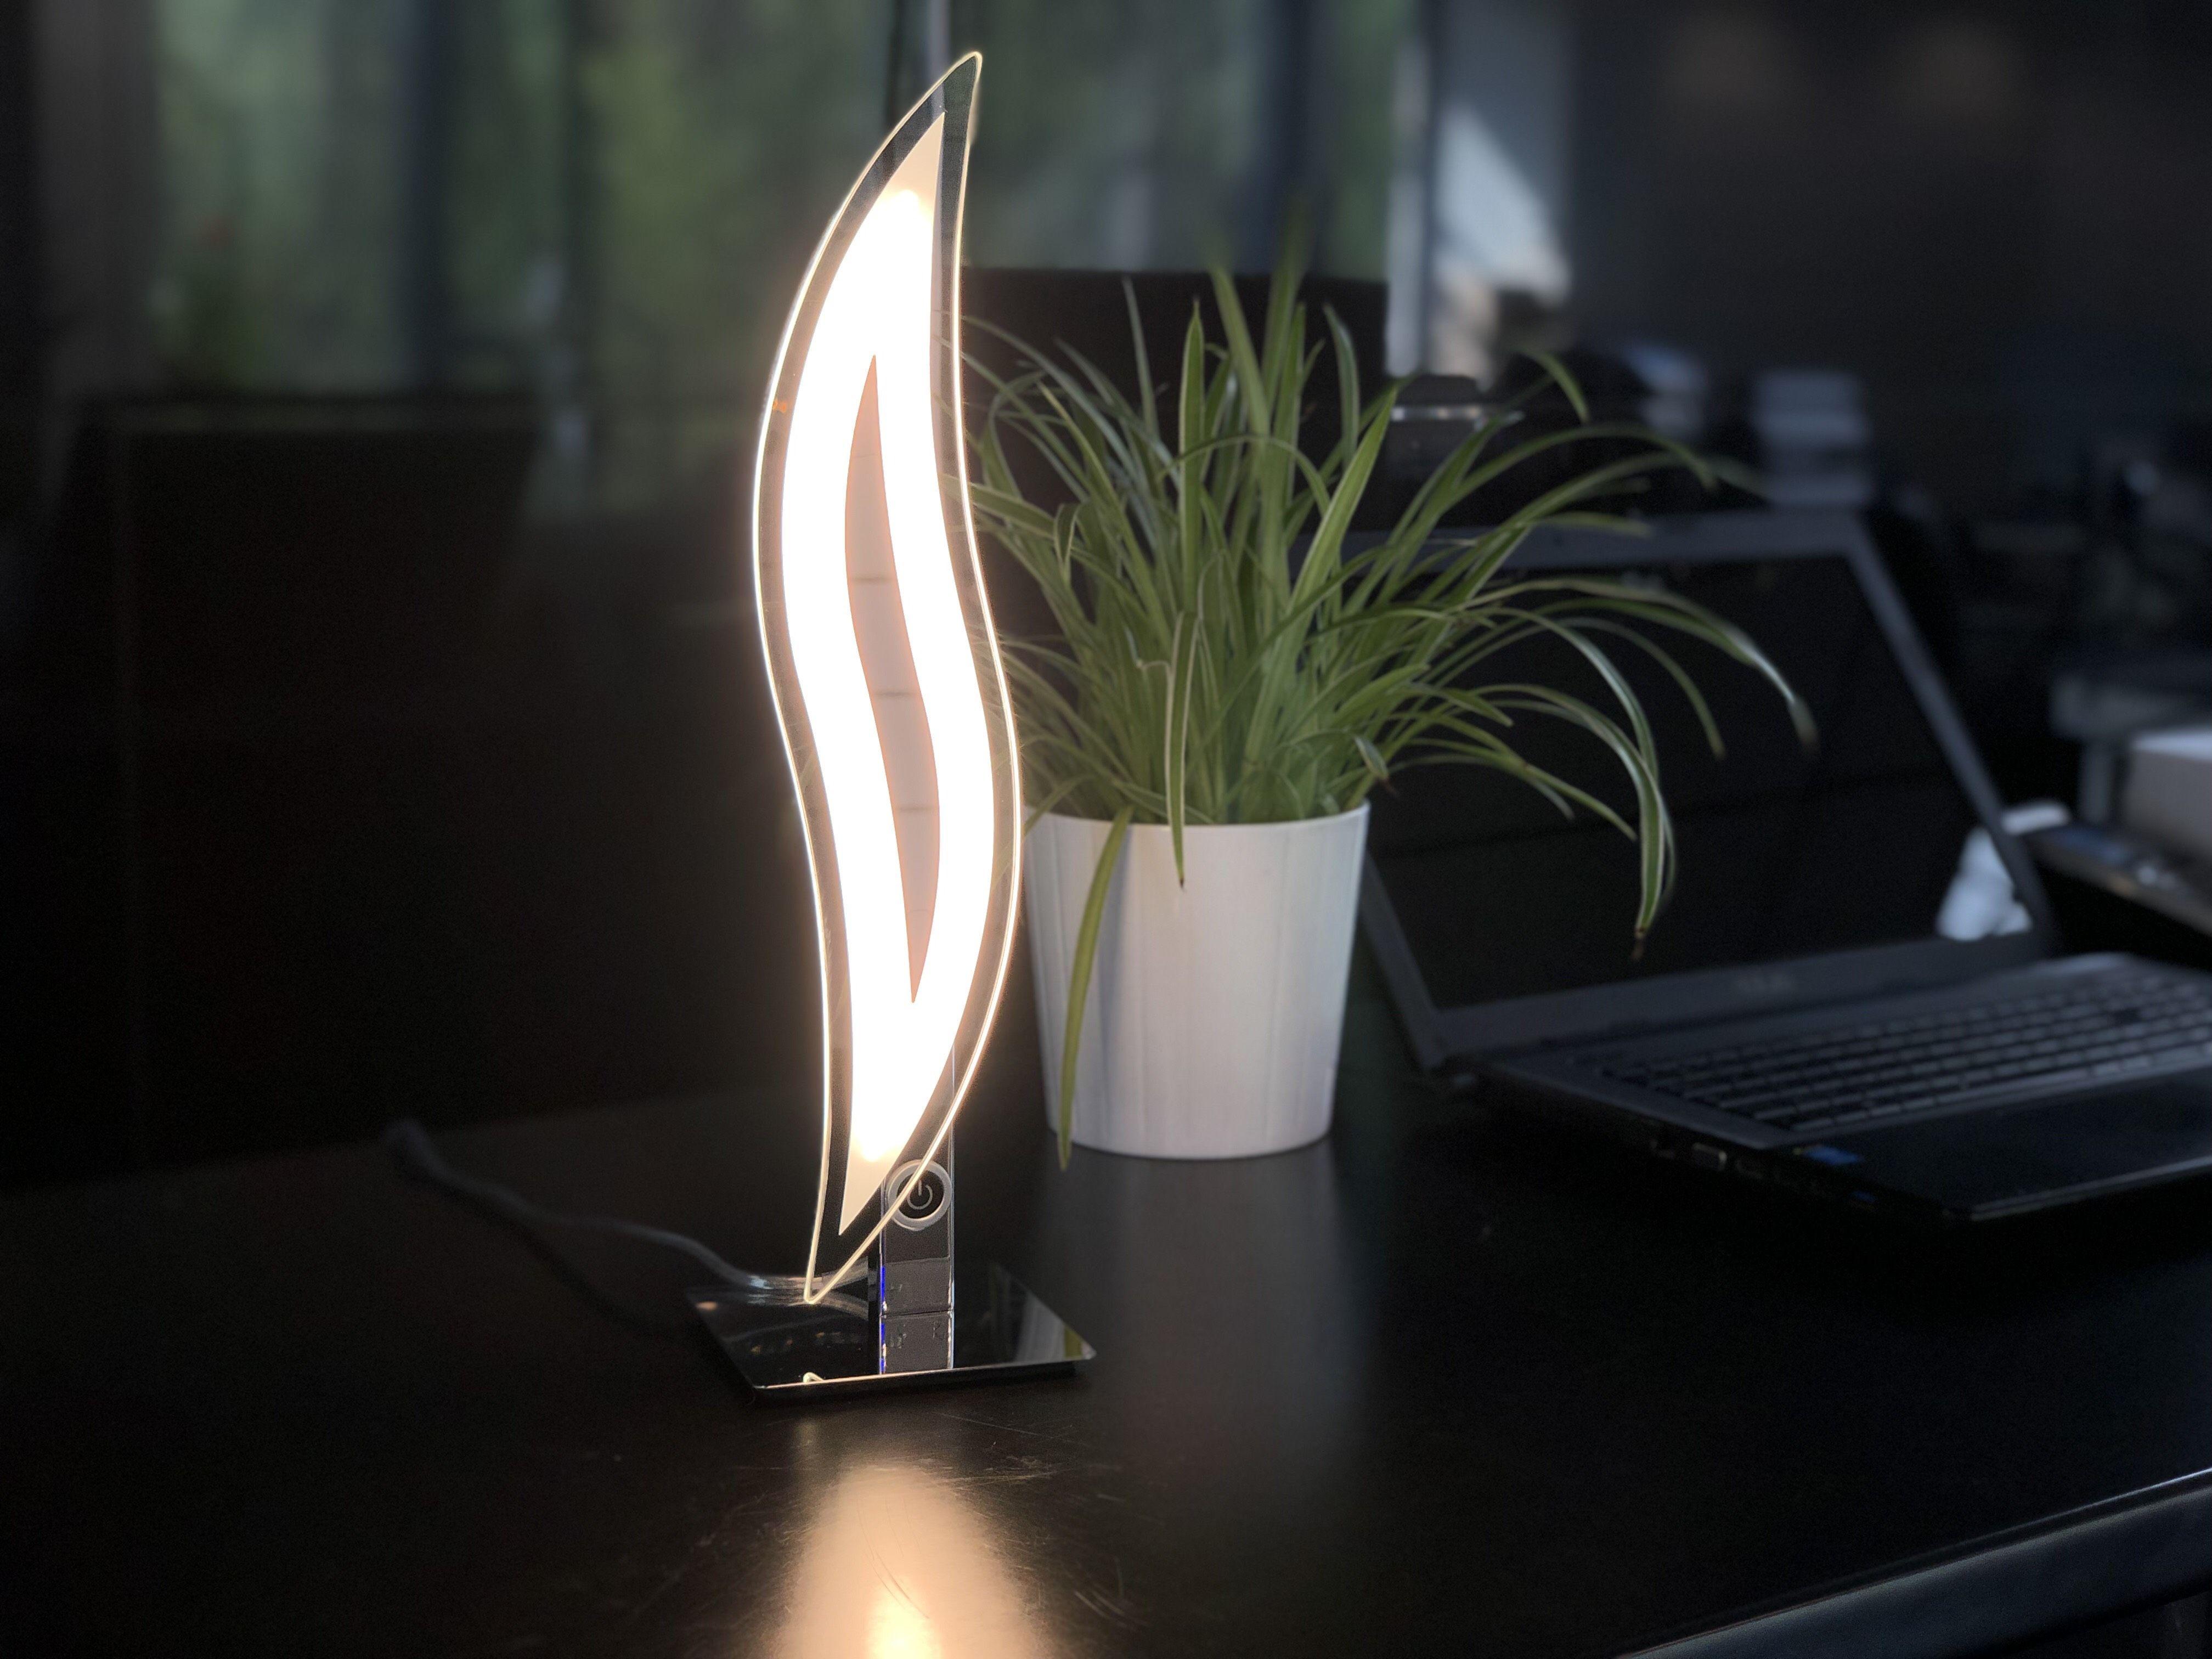 Lampe Flama 2019Lampes À Chrome Design En Led Poser Kosilum BWQrodCexE